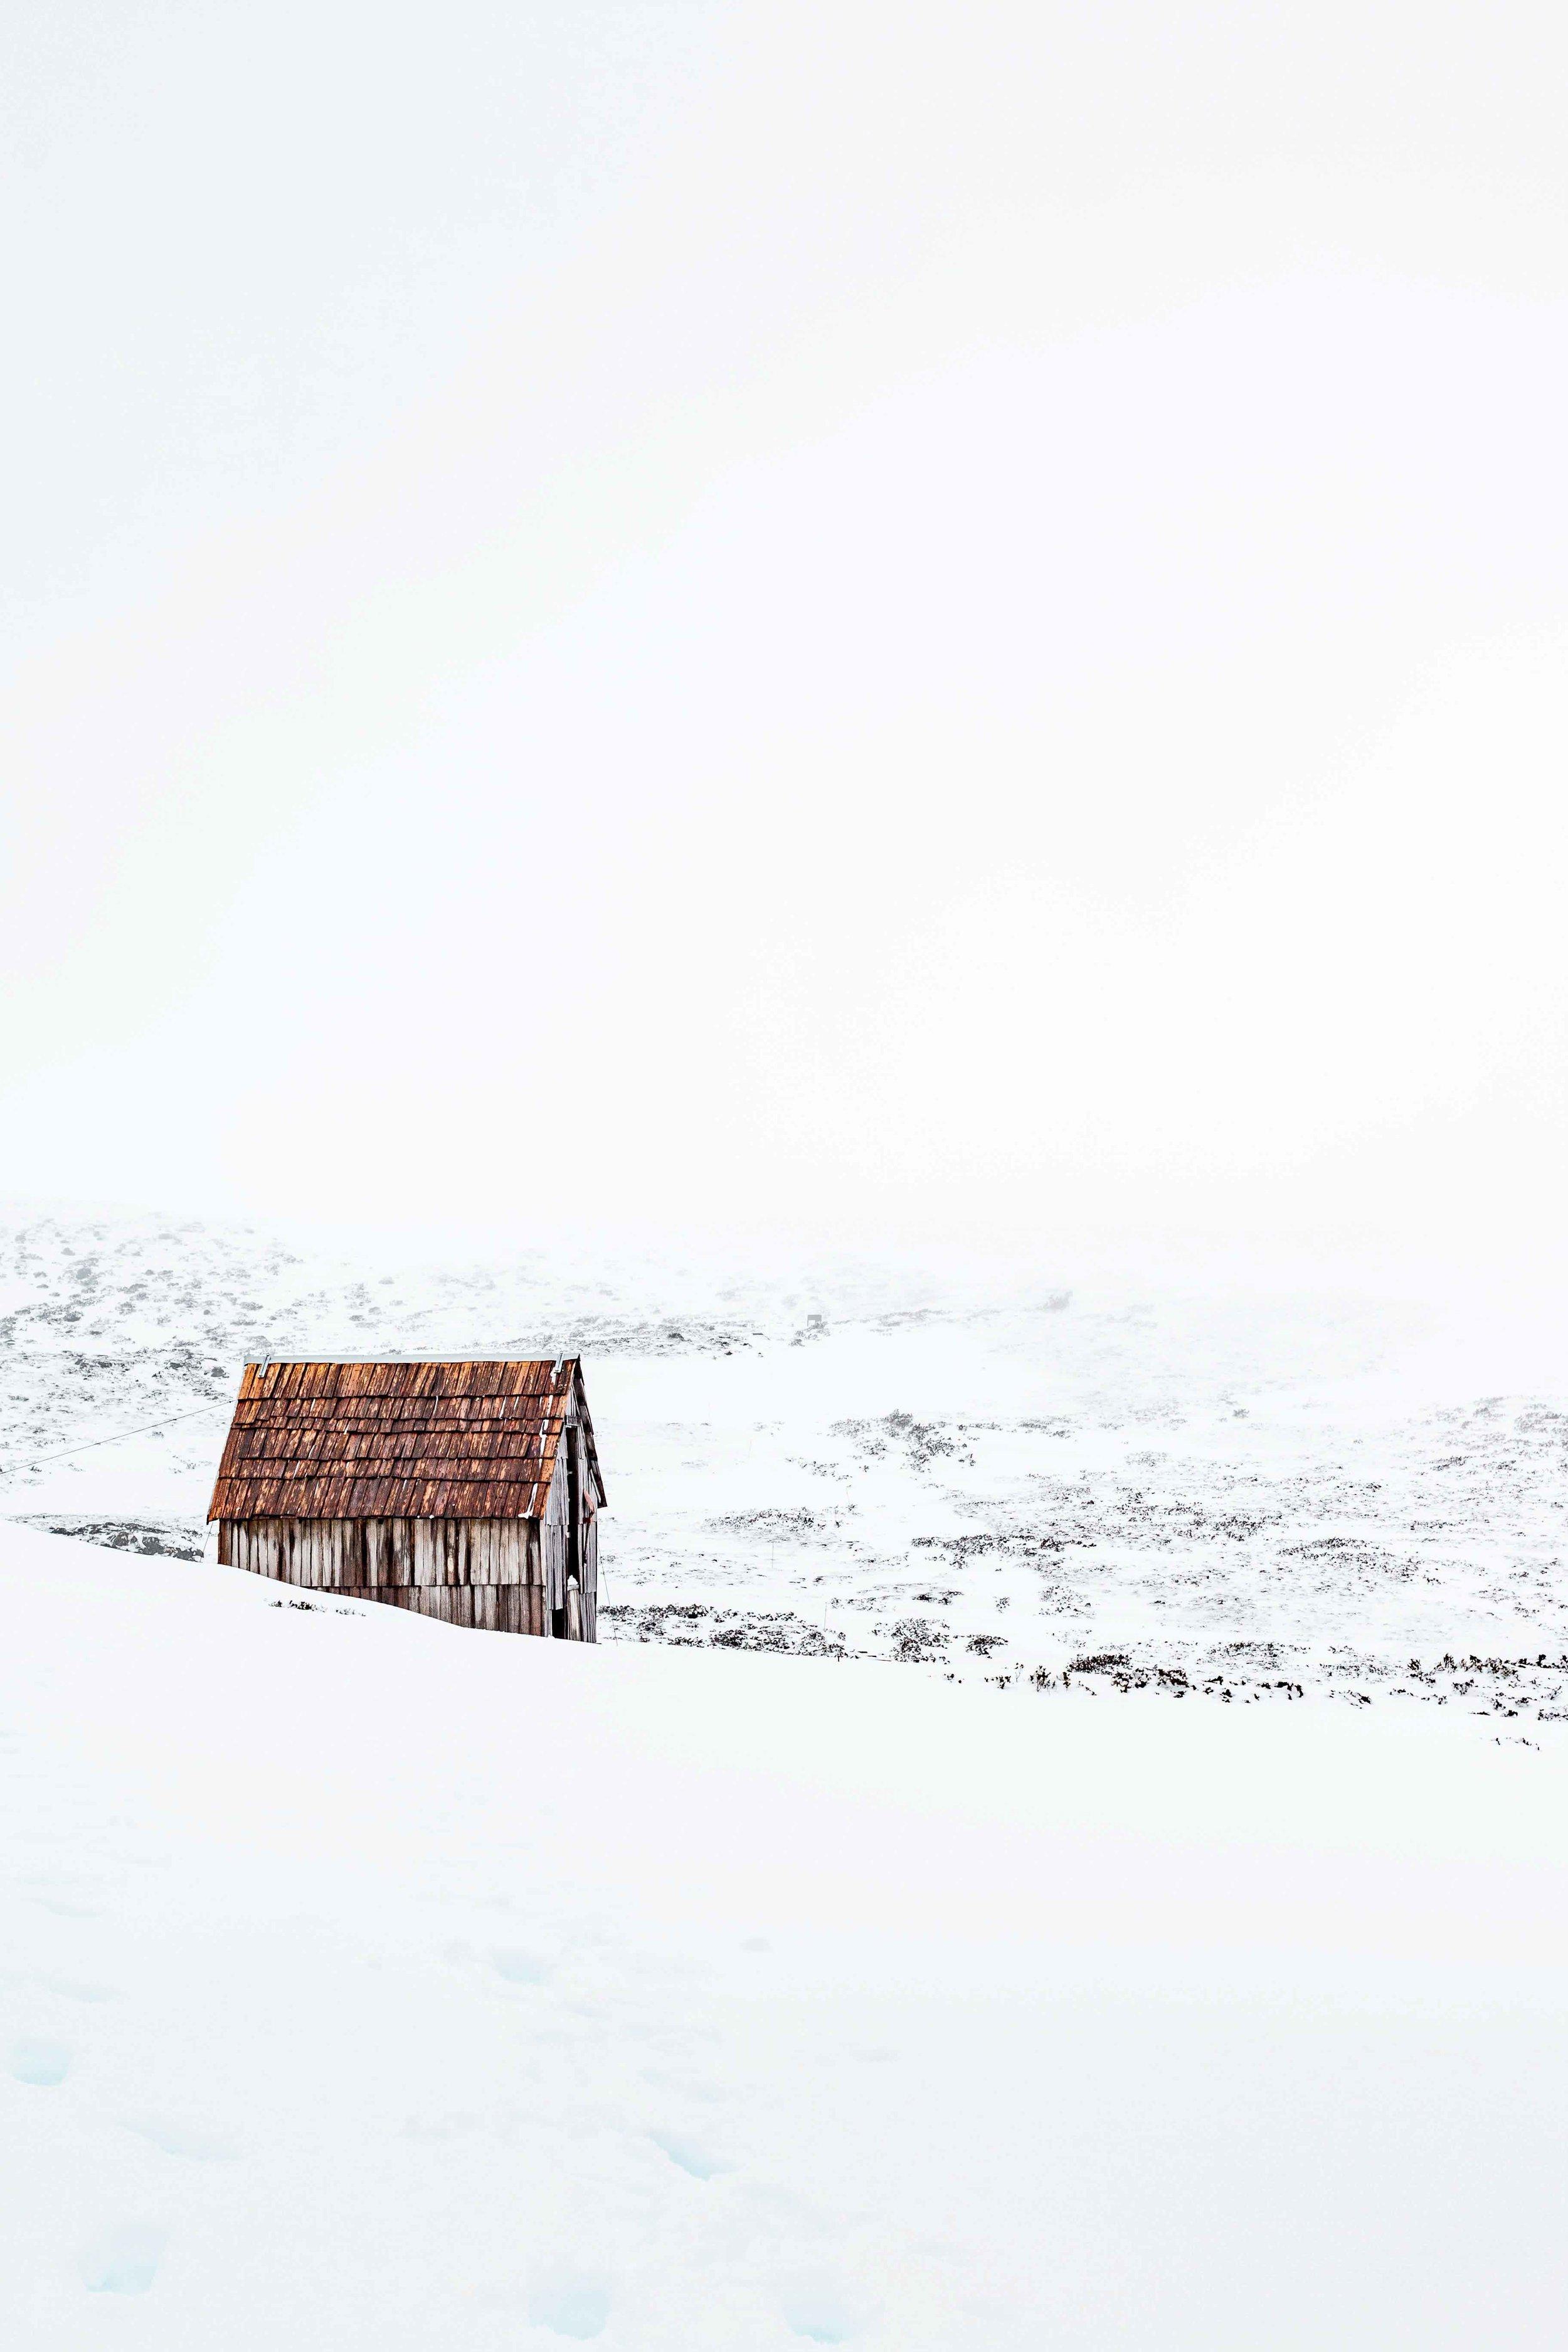 Snow Hut, Cradle Mountain, Tasmania